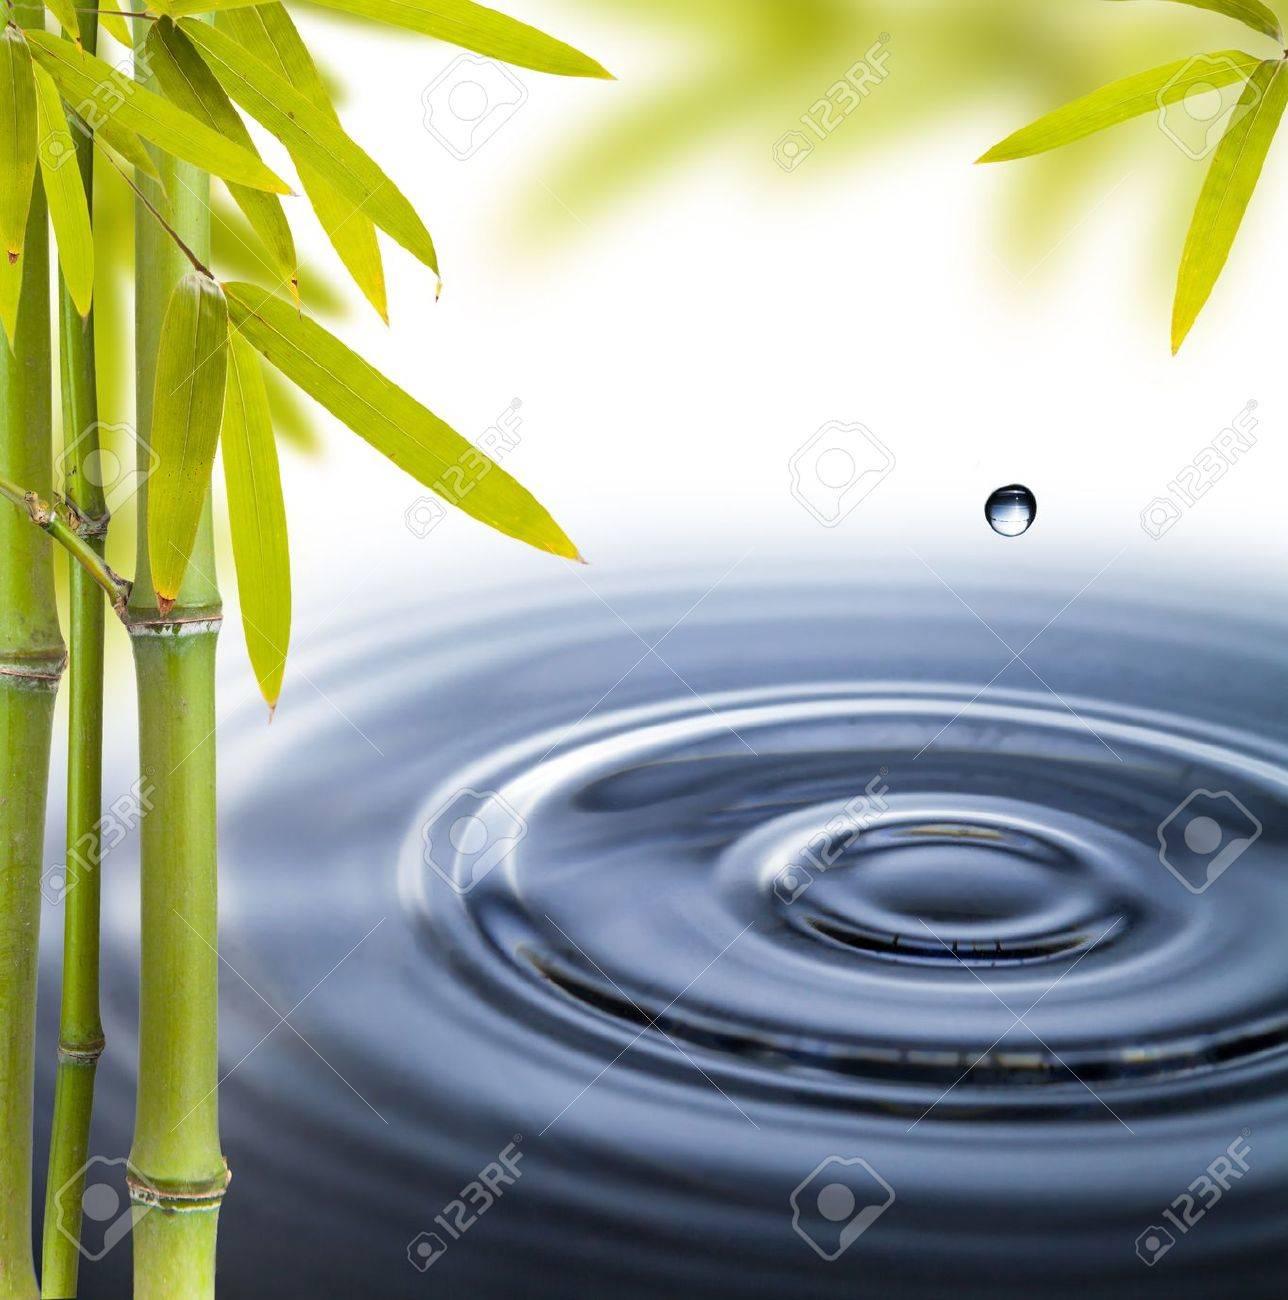 Spa still life with water circles Stock Photo - 18980930